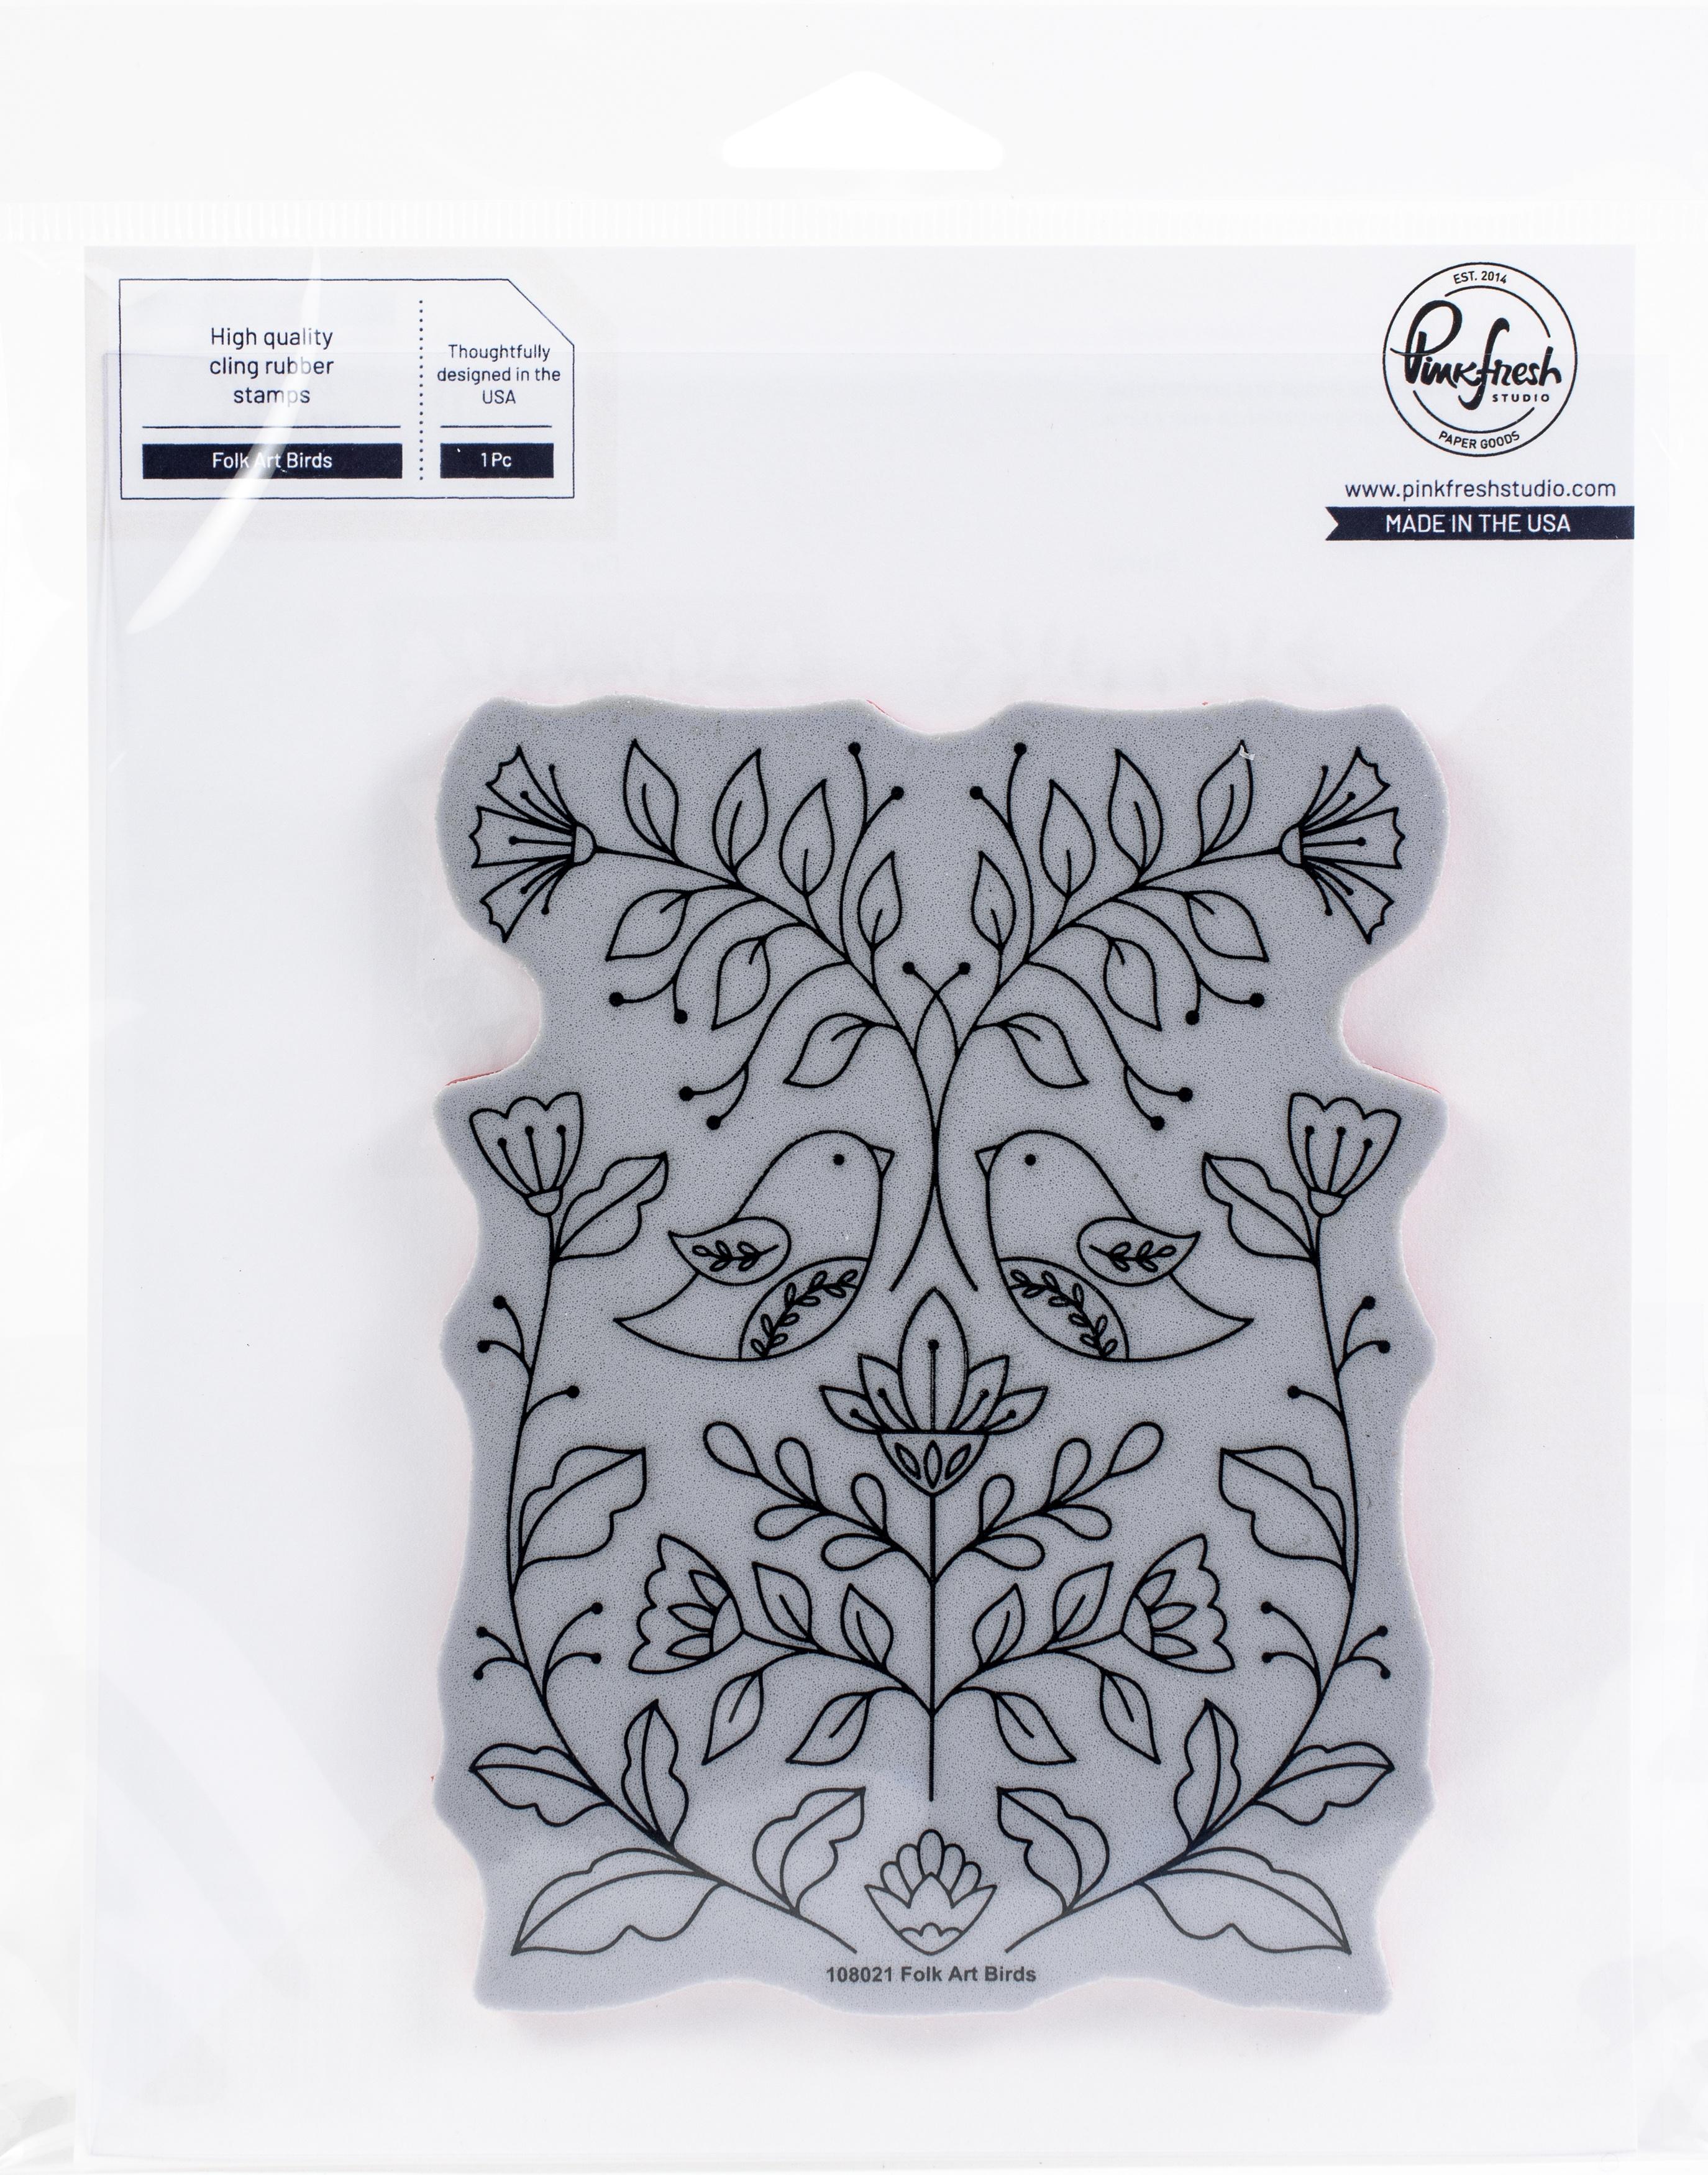 Pinkfresh Studio Cling Rubber Background Stamp A2-Folk Art Birds